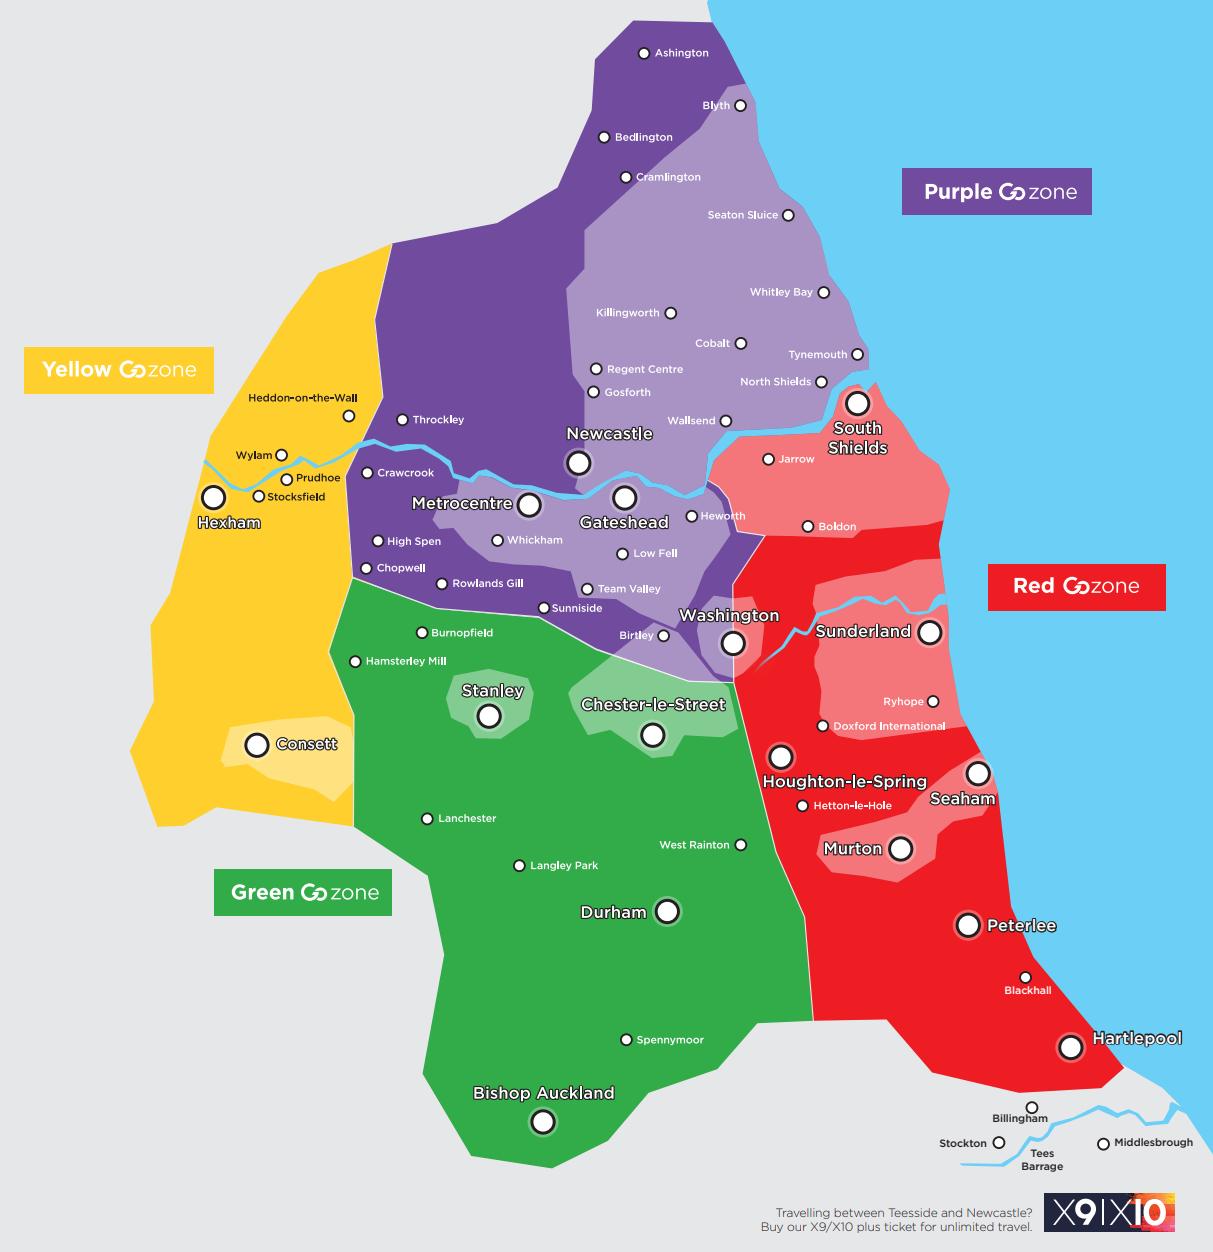 Go Zones map